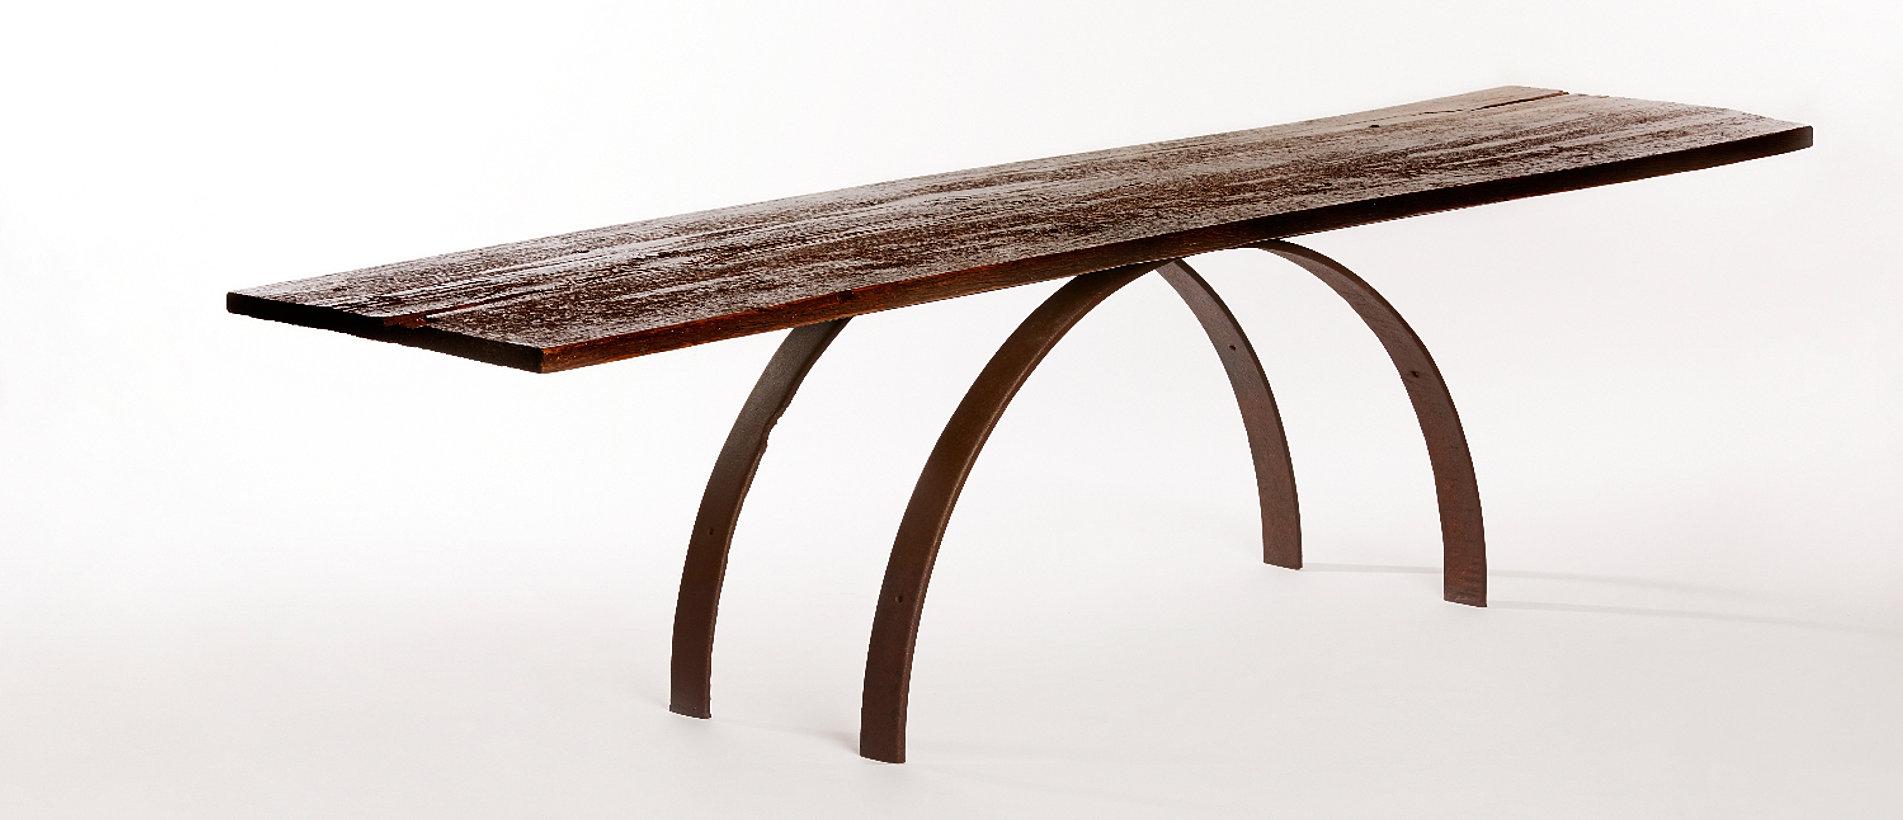 Farmhouse Tables Benches Ma Imagination Furnishings